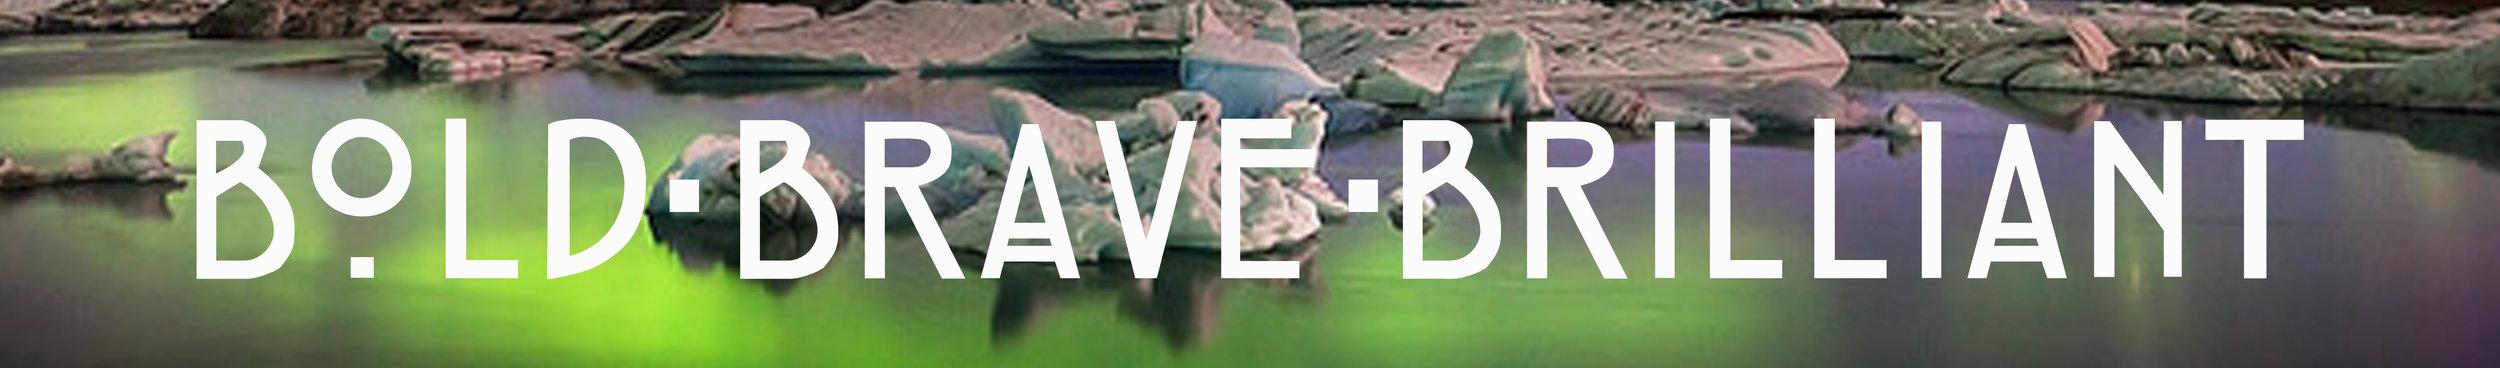 iceland-website3.jpg